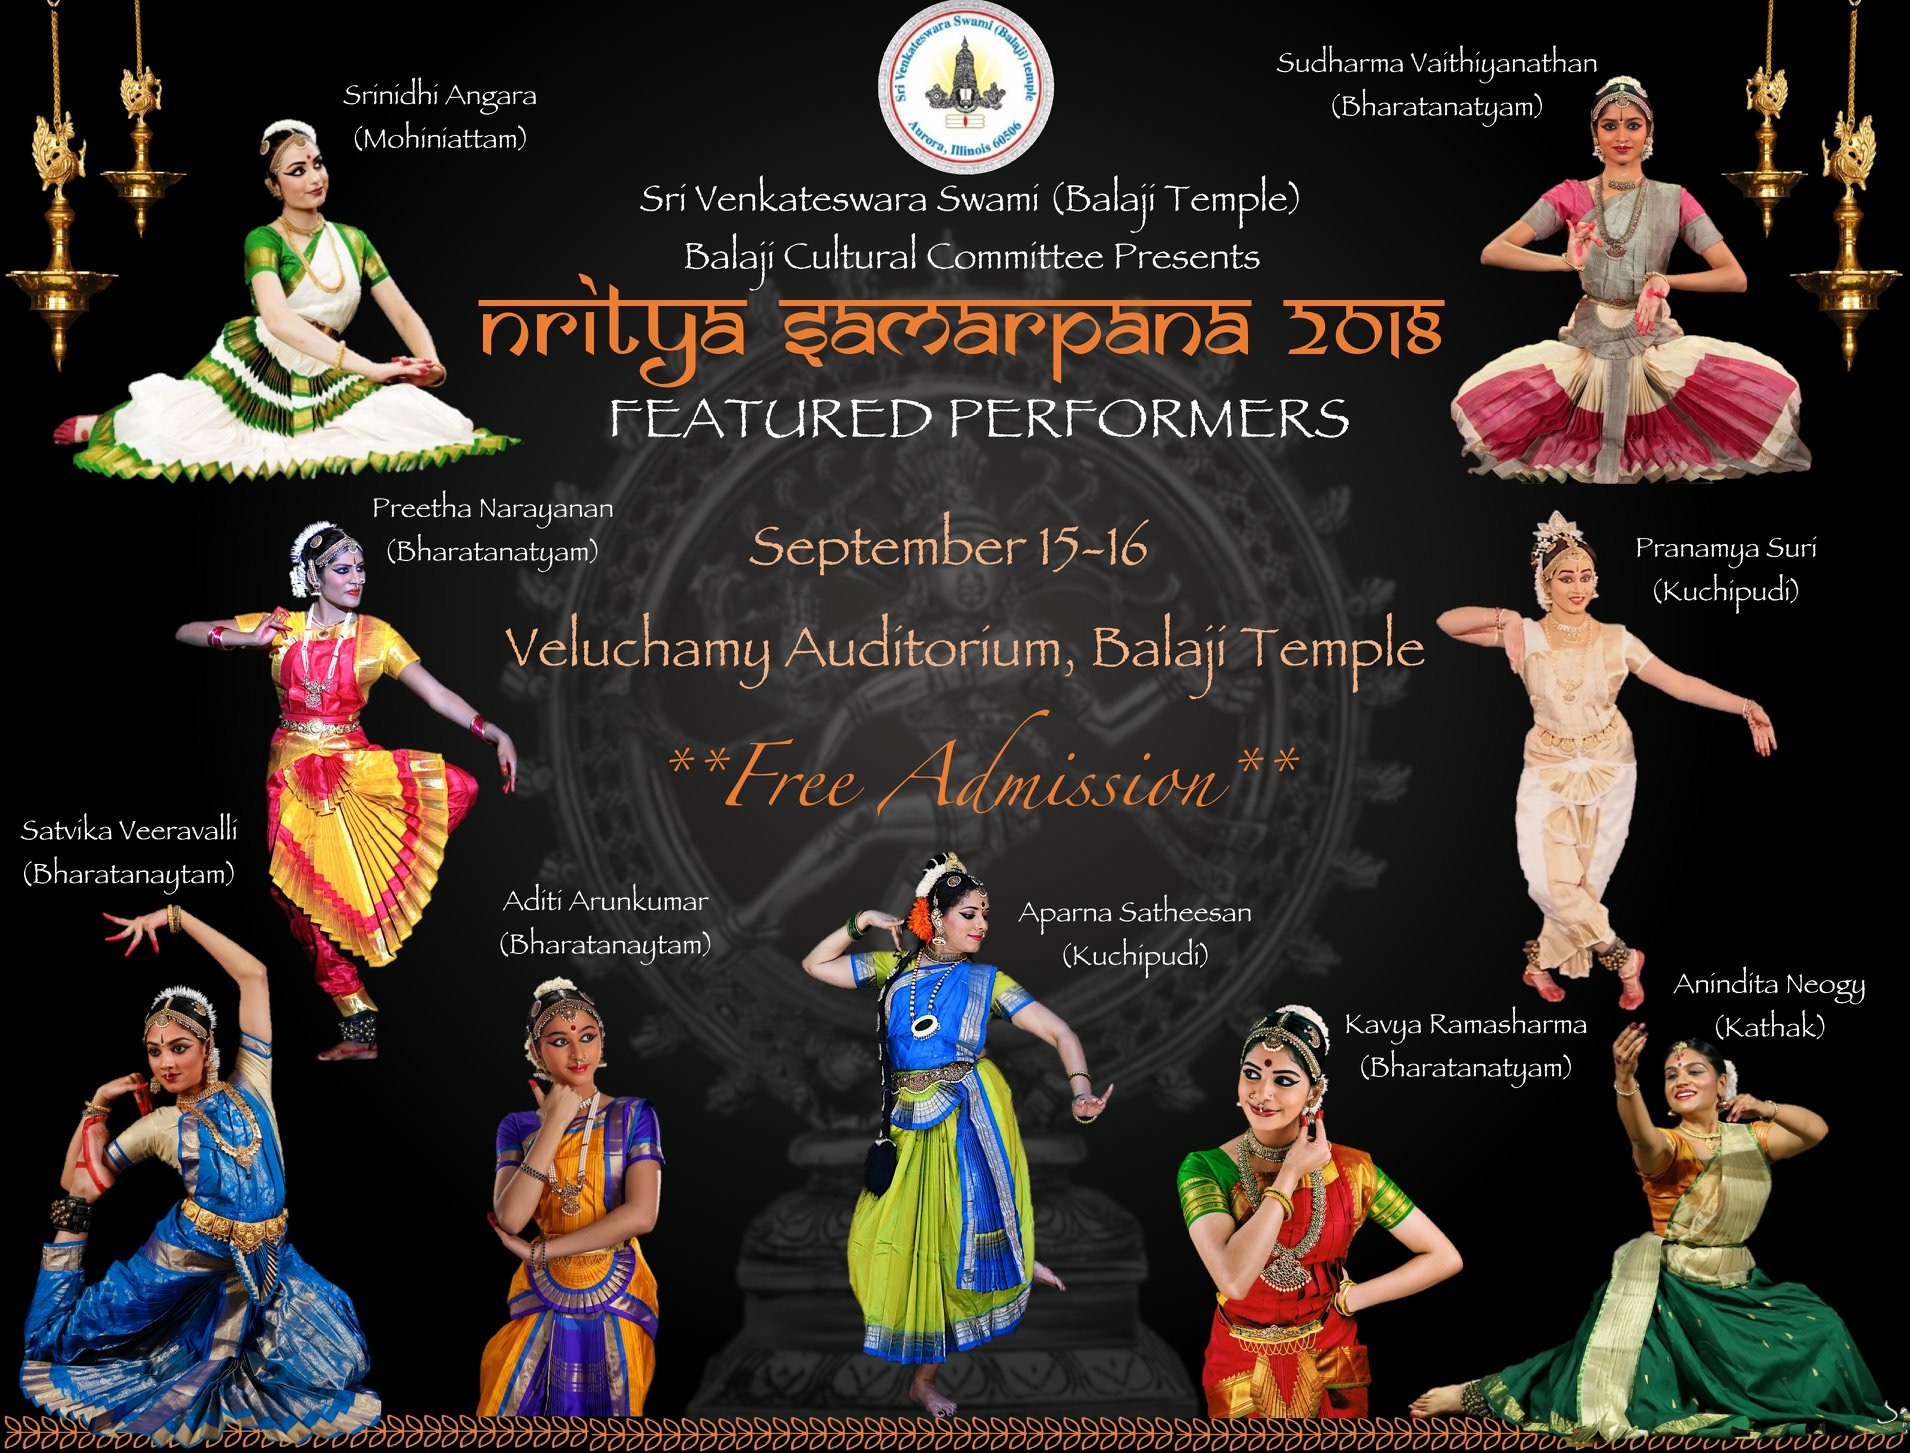 Nritya Samarpana Dance Festival